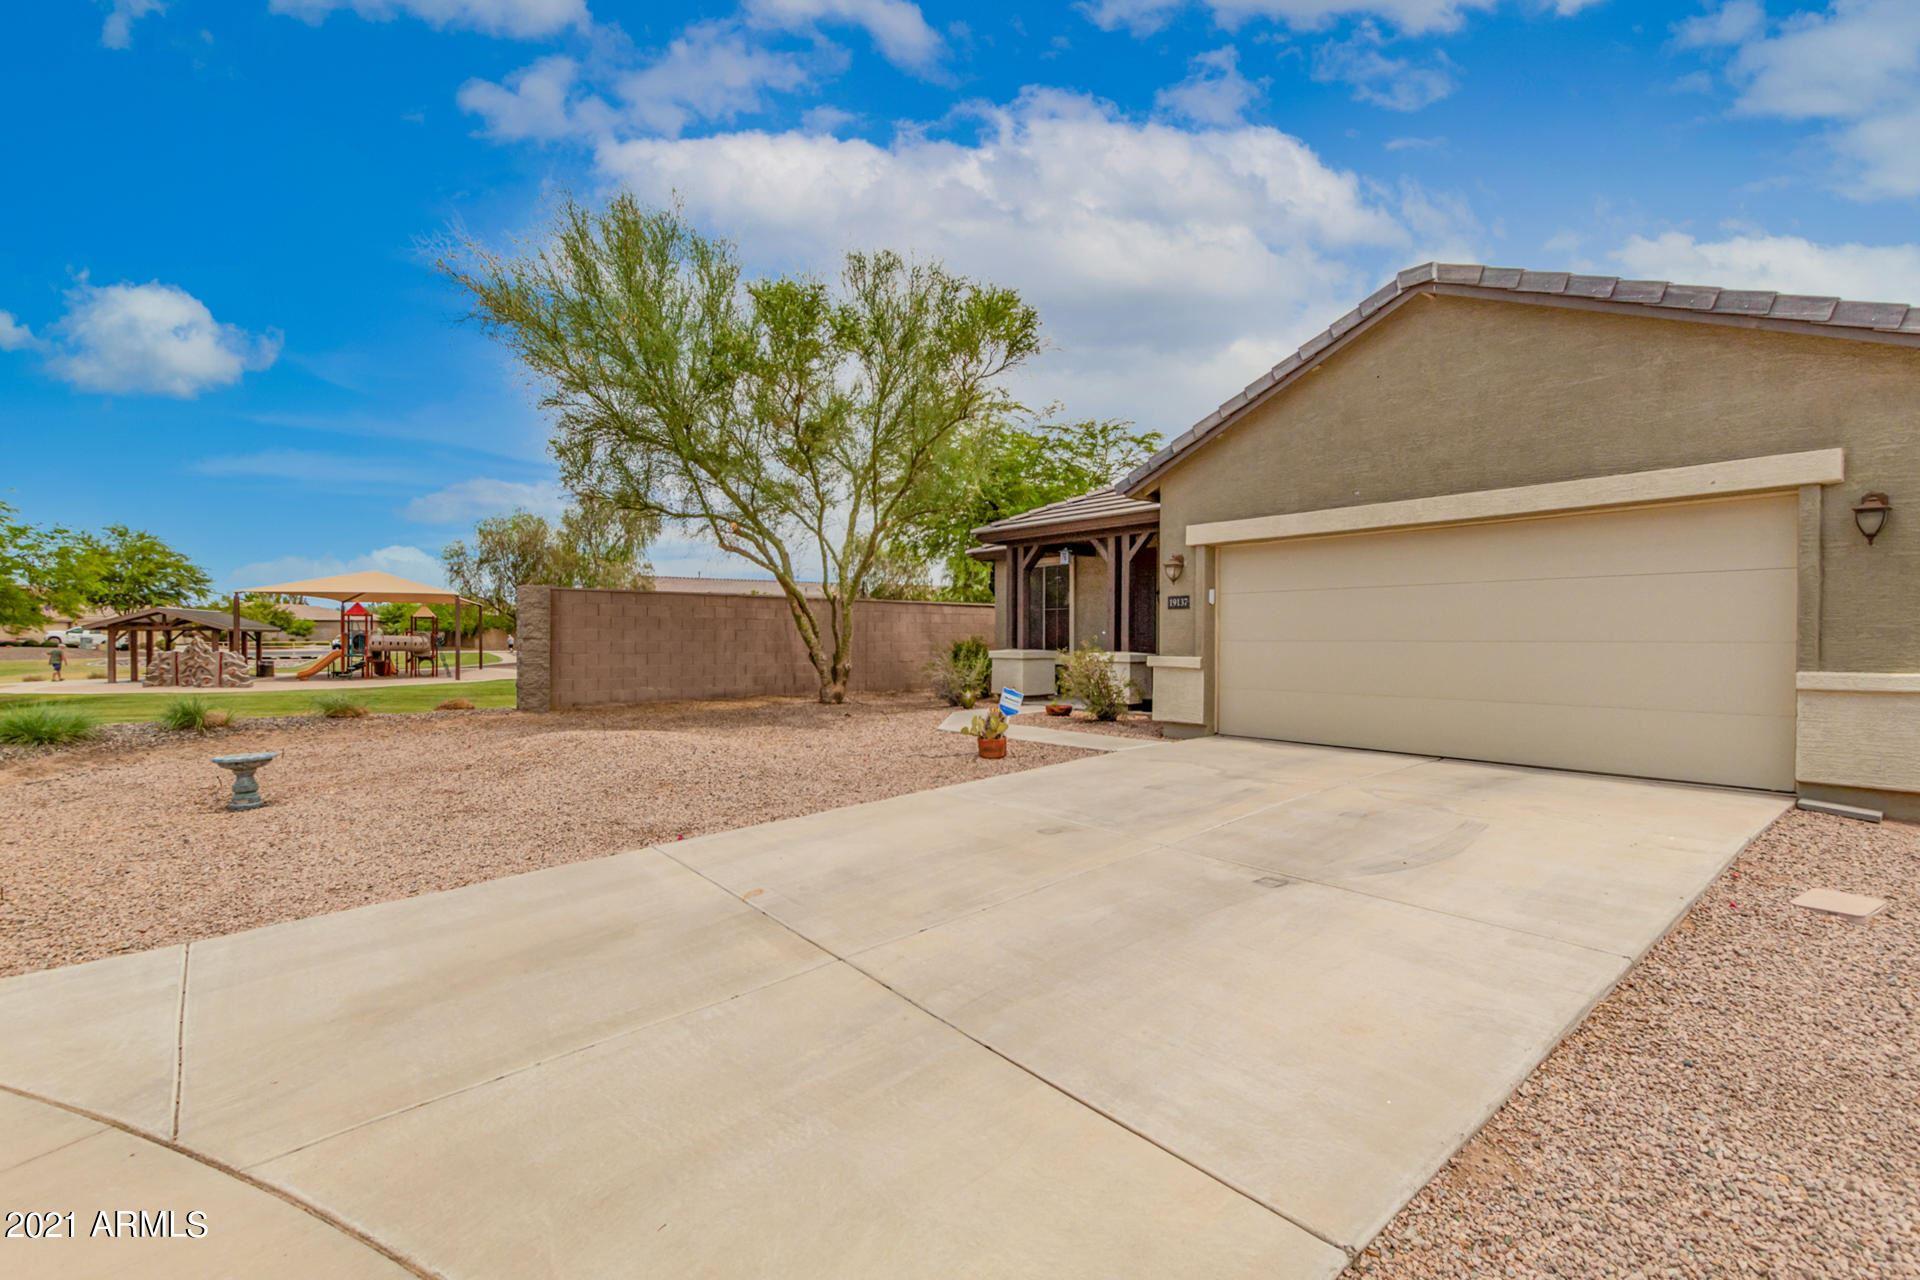 Photo of 19137 N ARBOR Drive, Maricopa, AZ 85138 (MLS # 6249590)